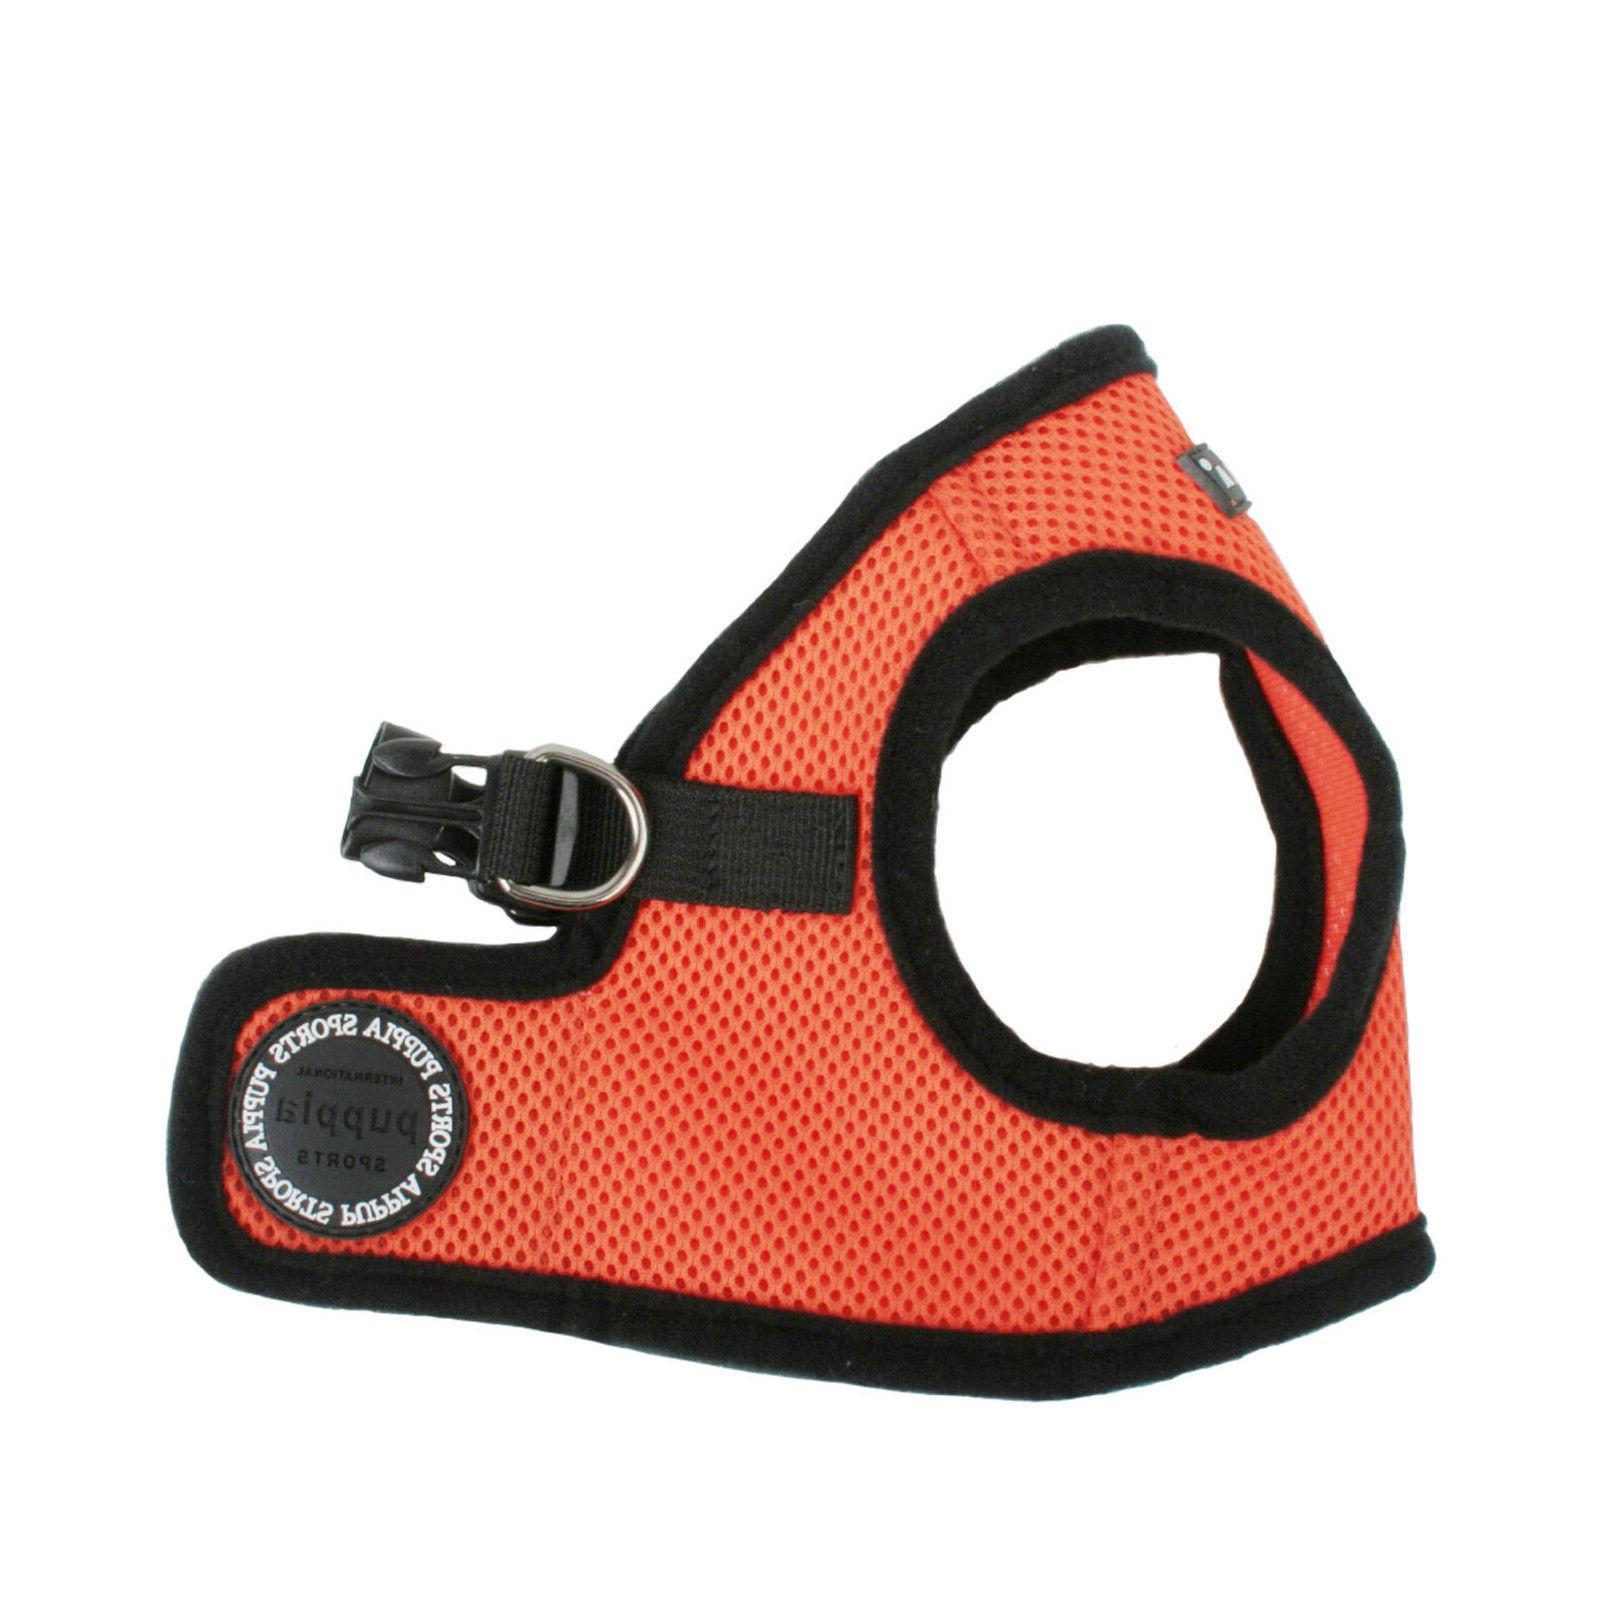 Puppia - Mesh Adjust. Breathable Dog Vest L, AH305